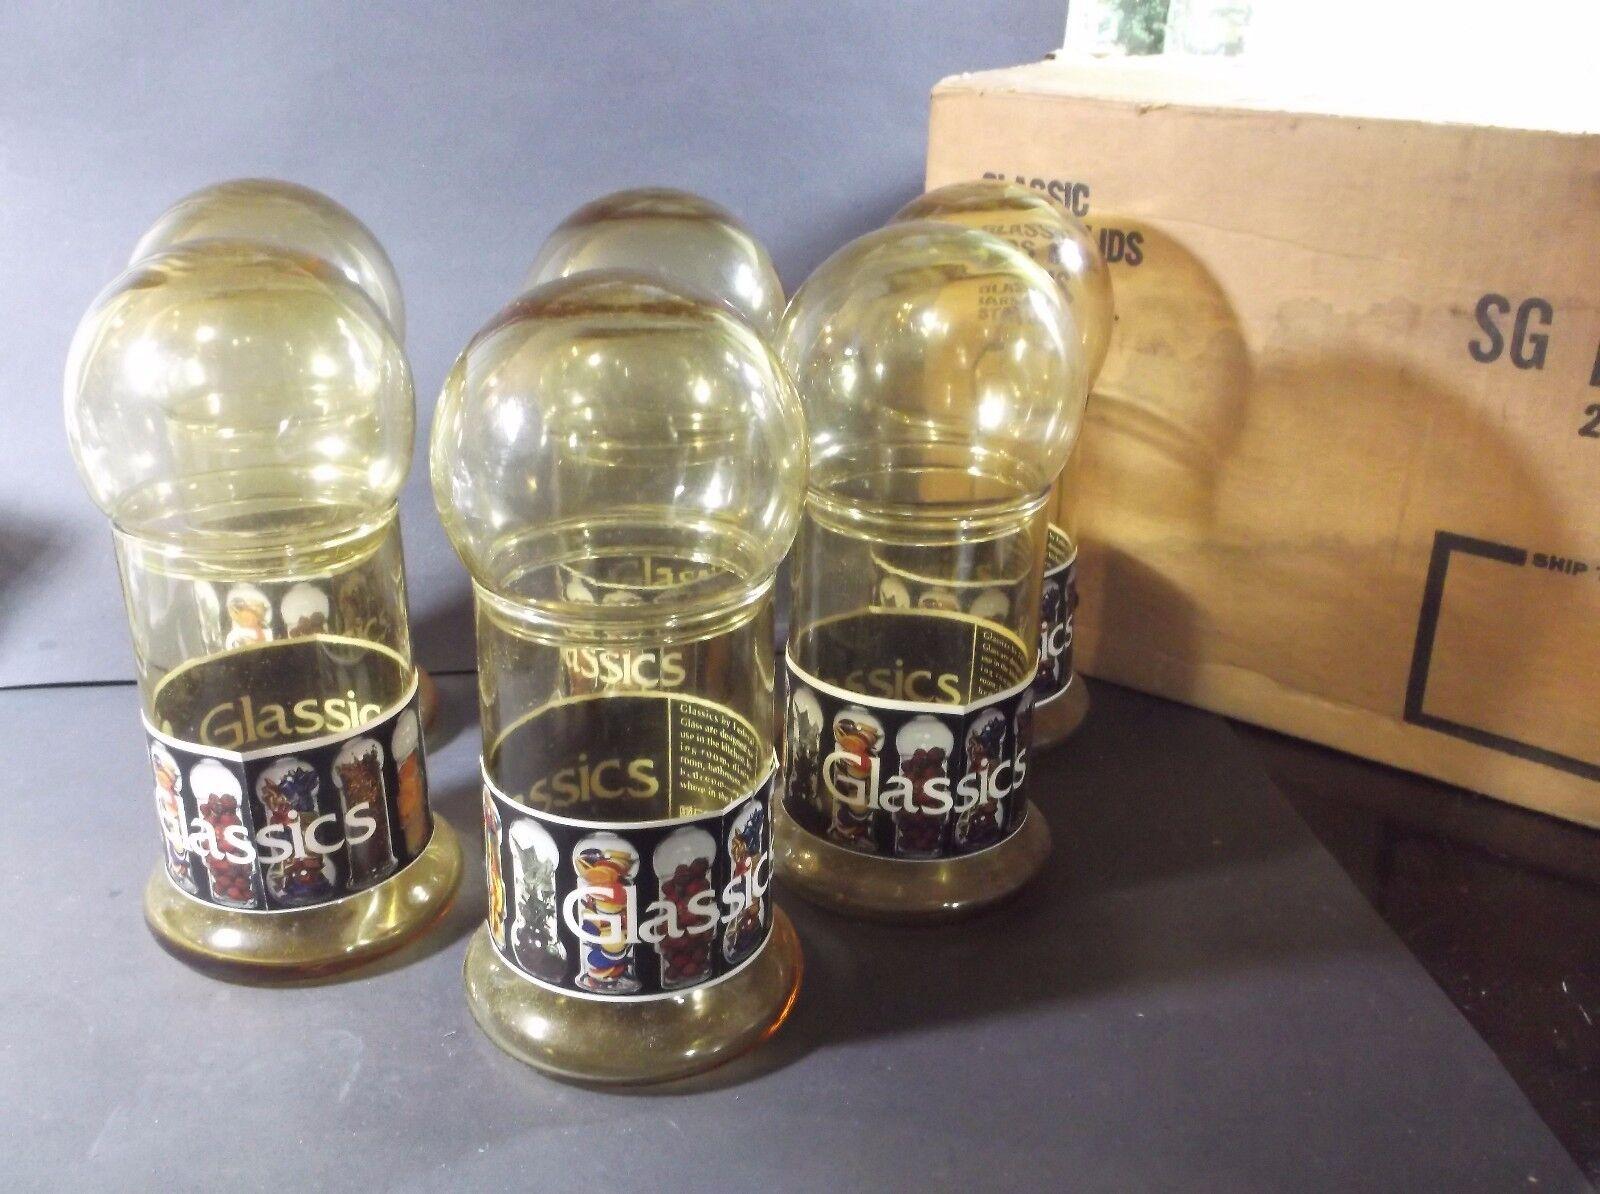 Federal Glass Status Glassic storage jars